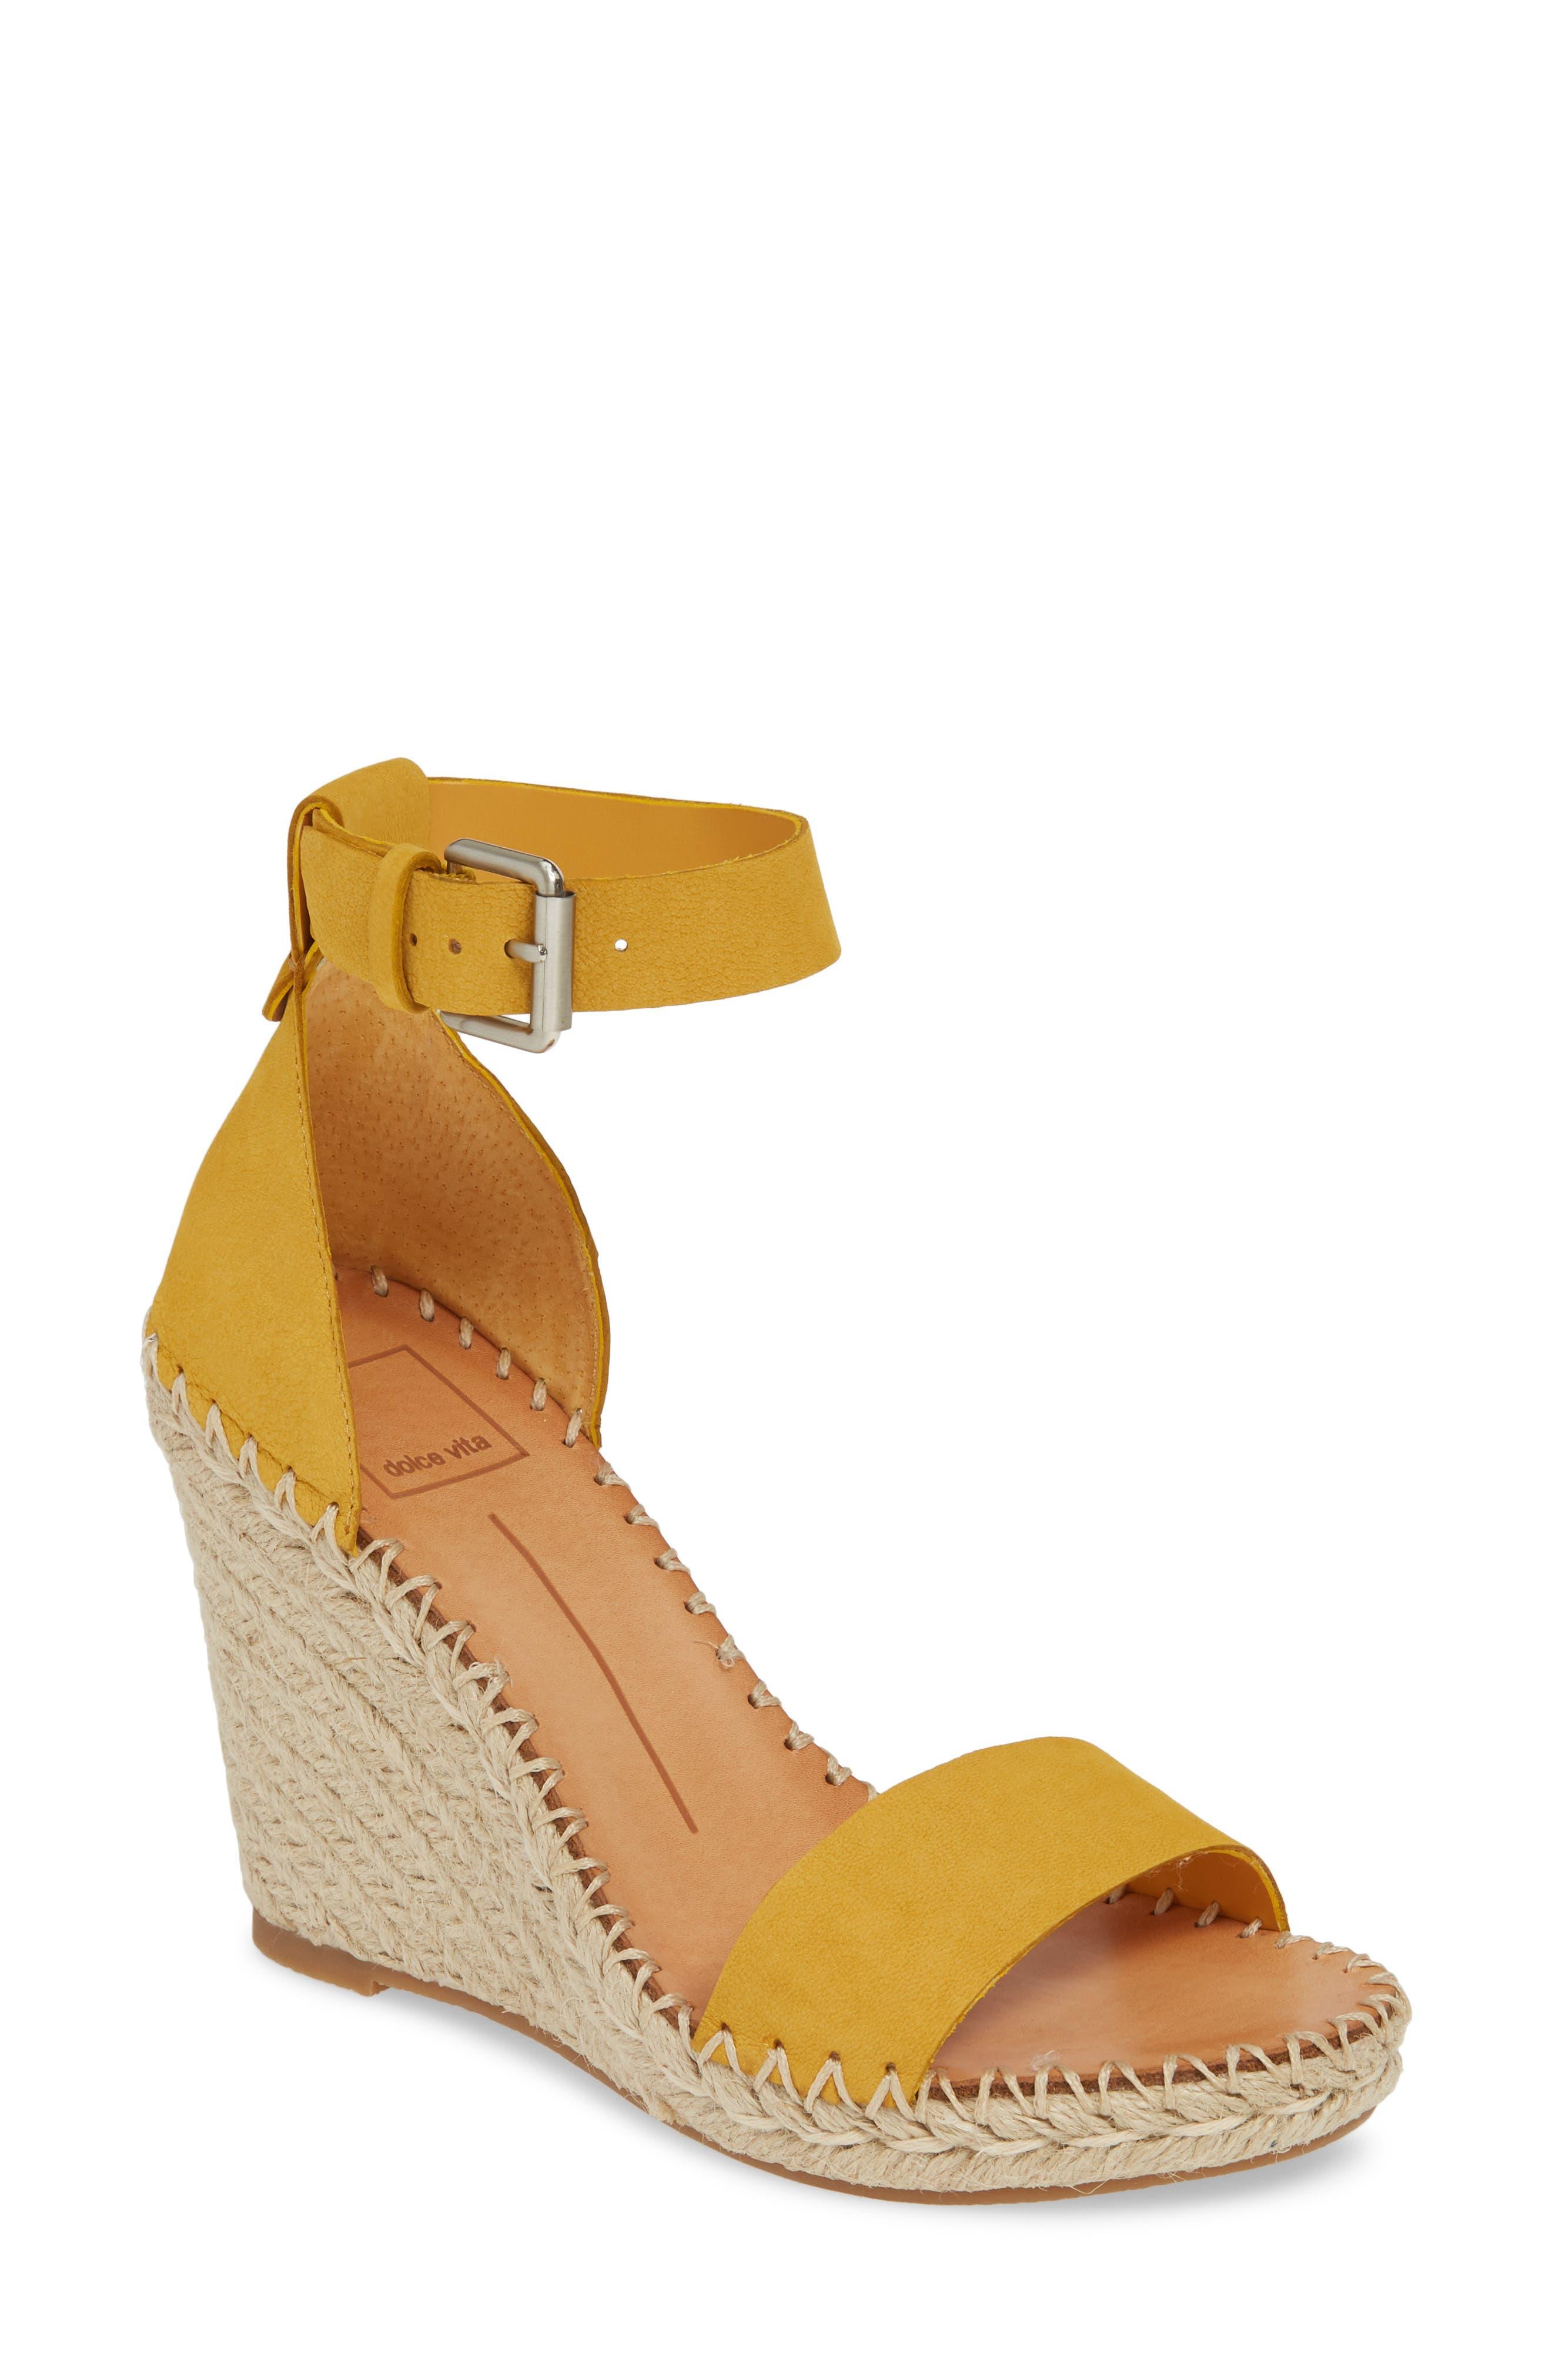 4f92109d43f Women s Sandals New Arrivals  Clothing